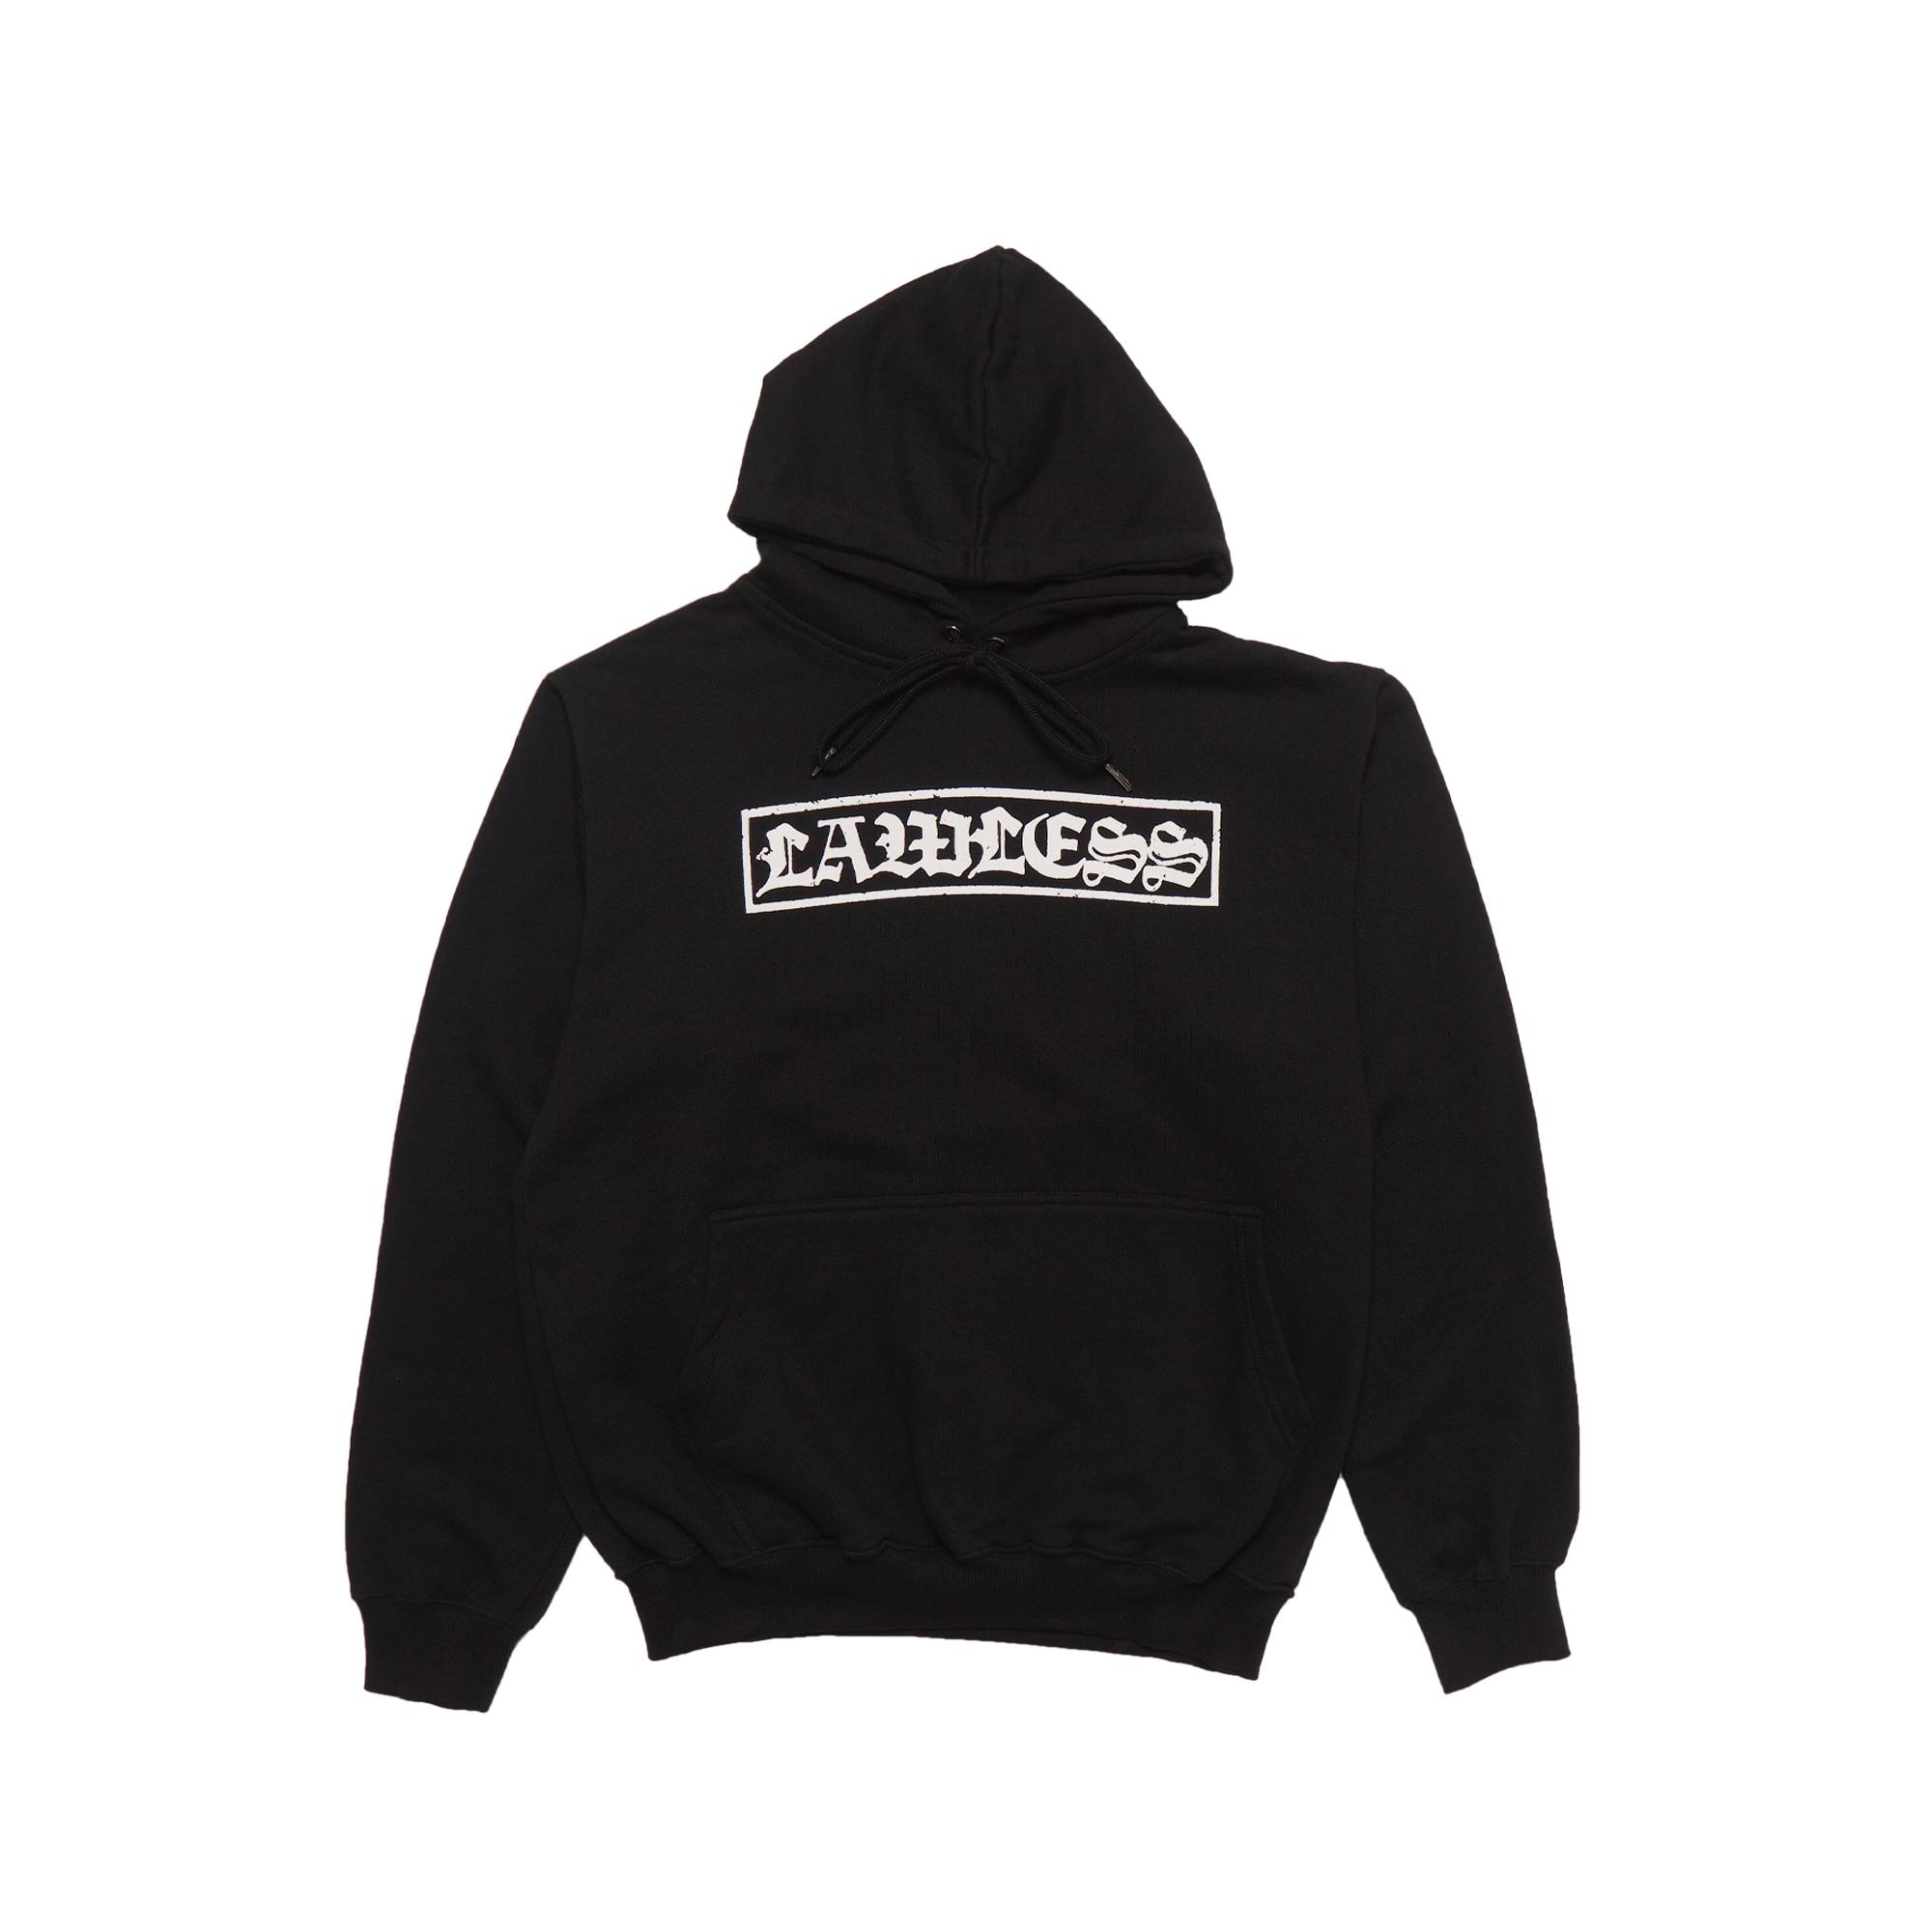 lawless-hoodie-maniac